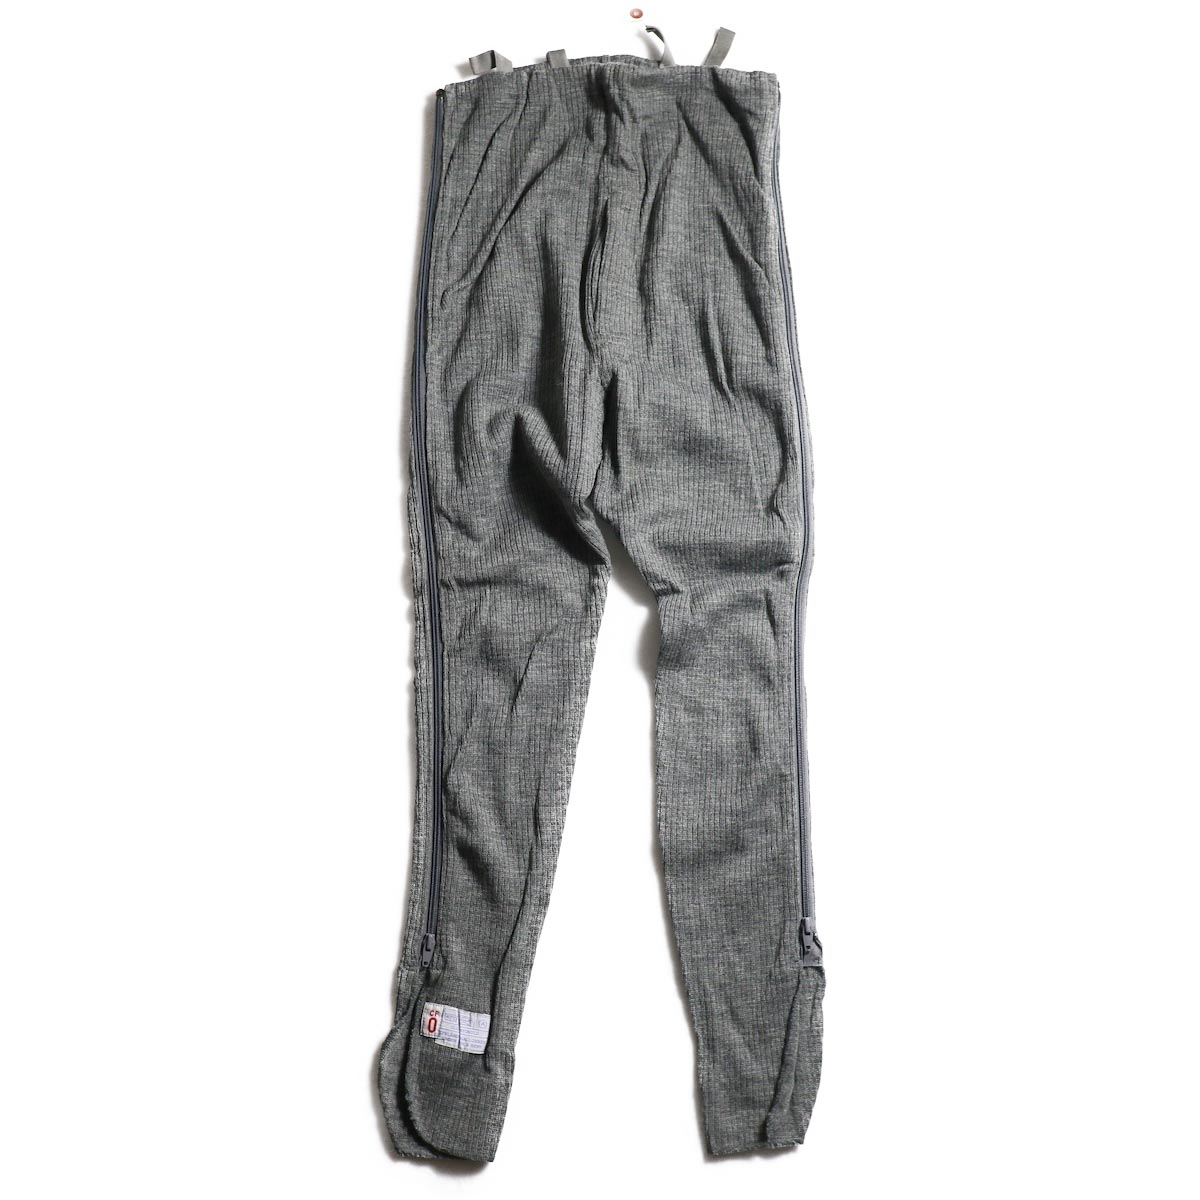 Denmark Military / Side Zip Under Pants (Medium) (A)